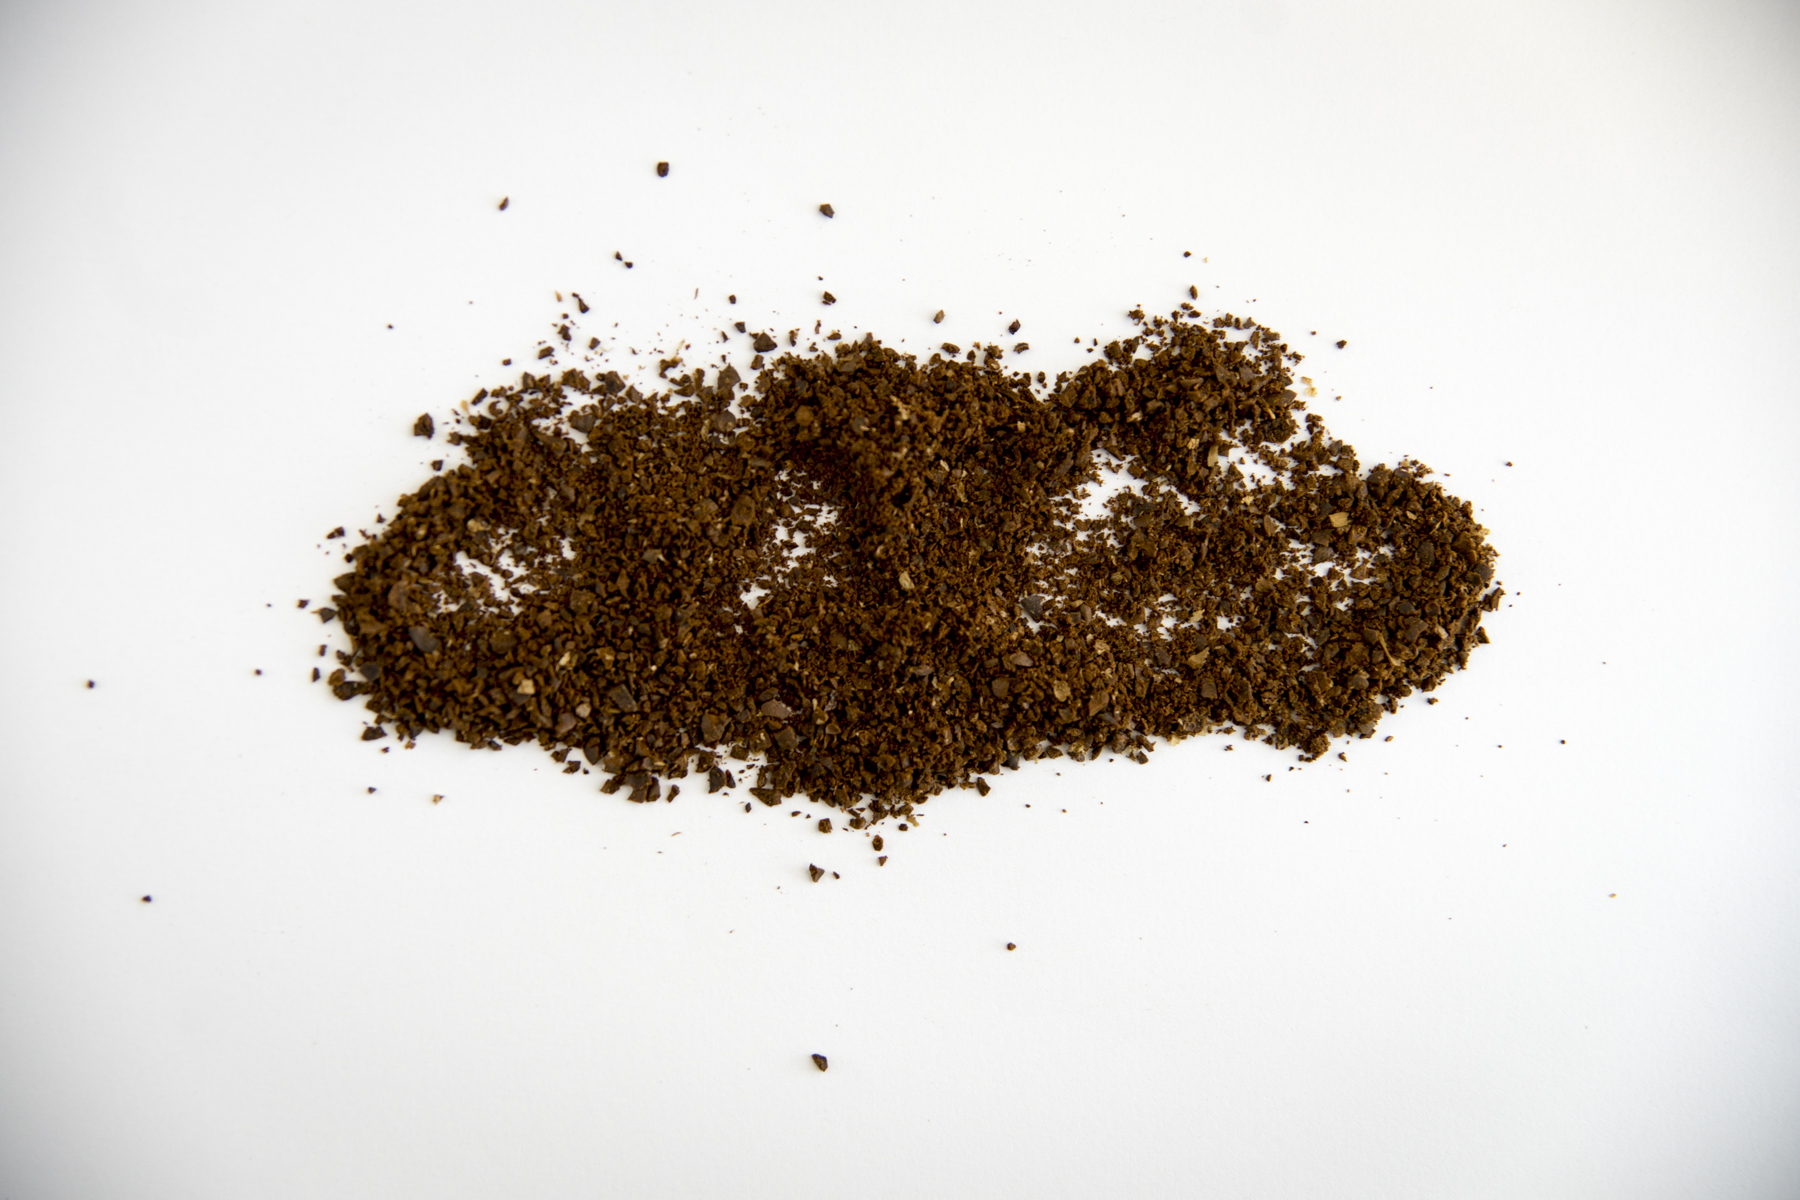 Medium grind of Wilfa